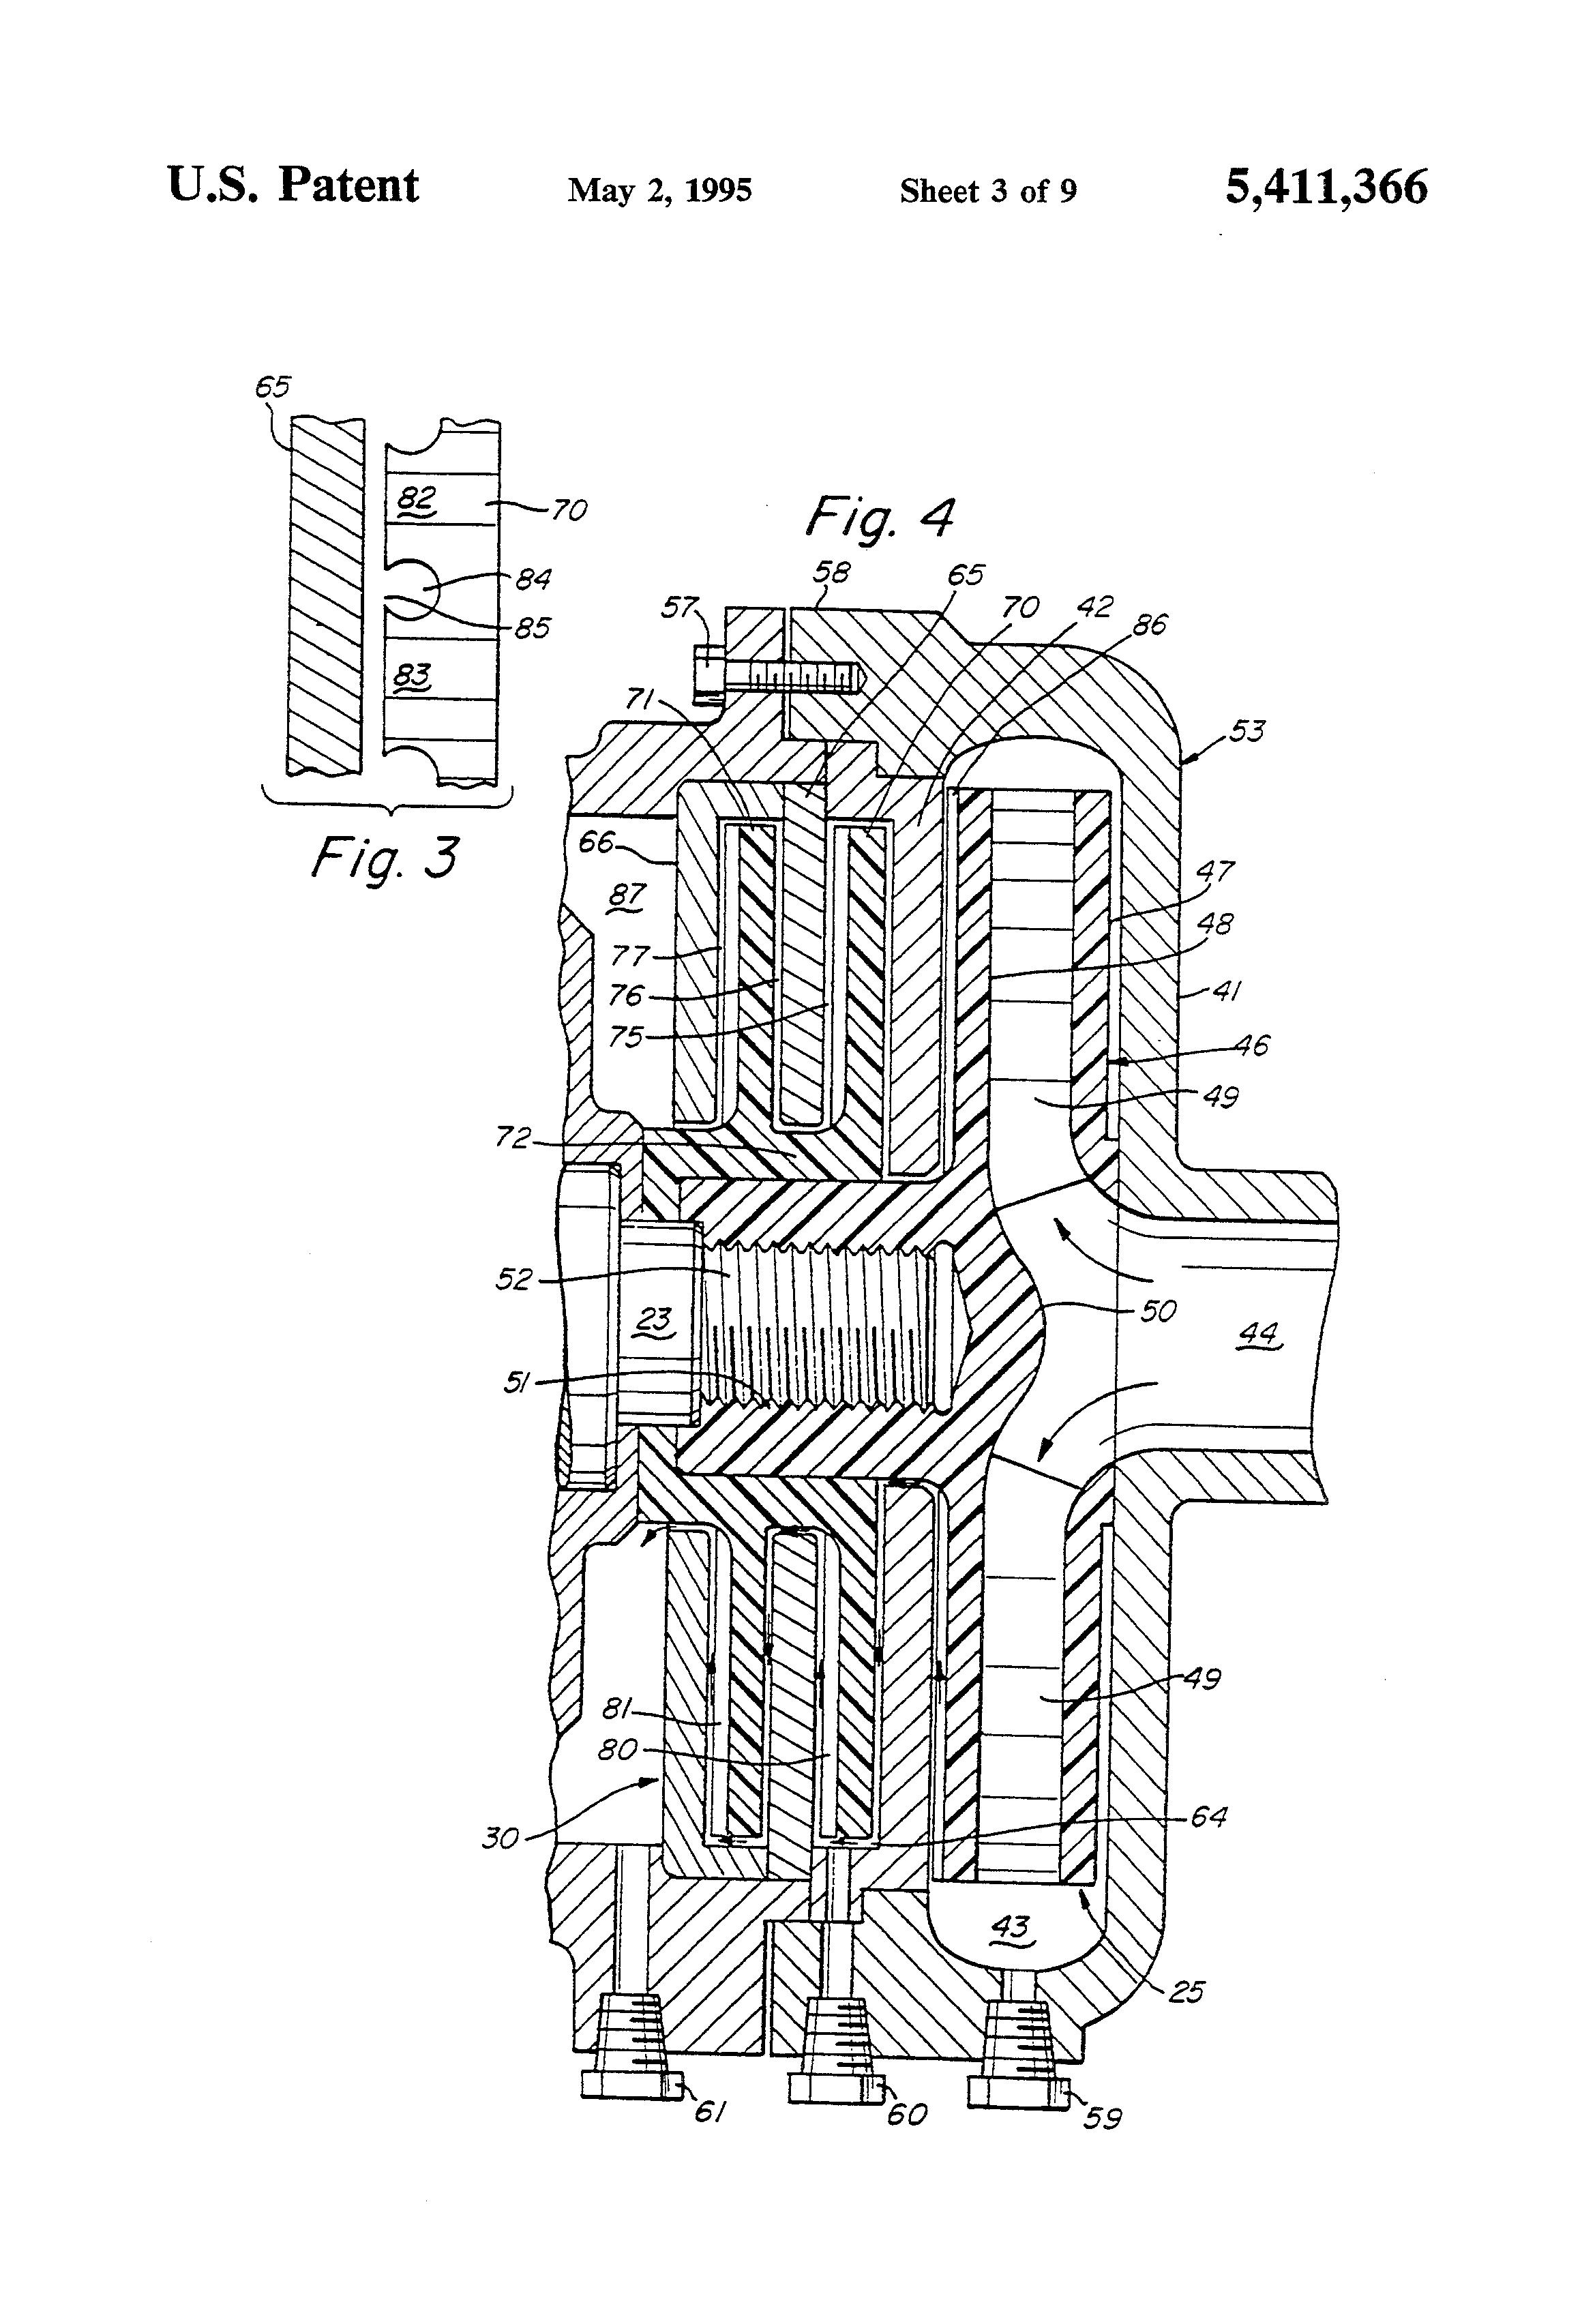 nissan altima wiring harness diagram wv 8094  altima engine wiring diagram furthermore nissan frontier  wv 8094  altima engine wiring diagram